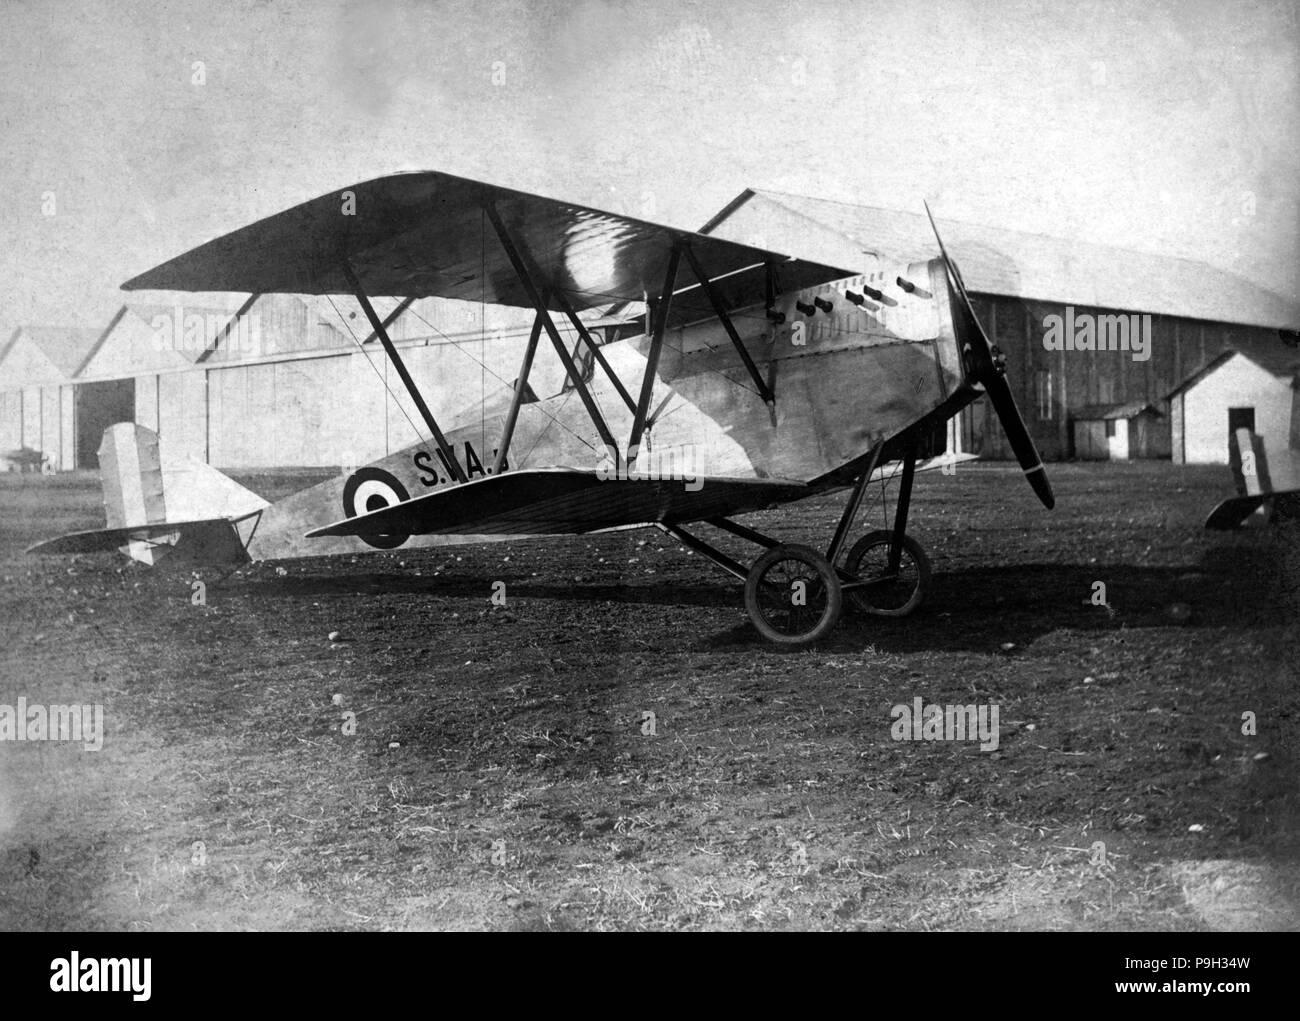 England. Magenta SVA biplane parked on an airfield, 1918. - Stock Image